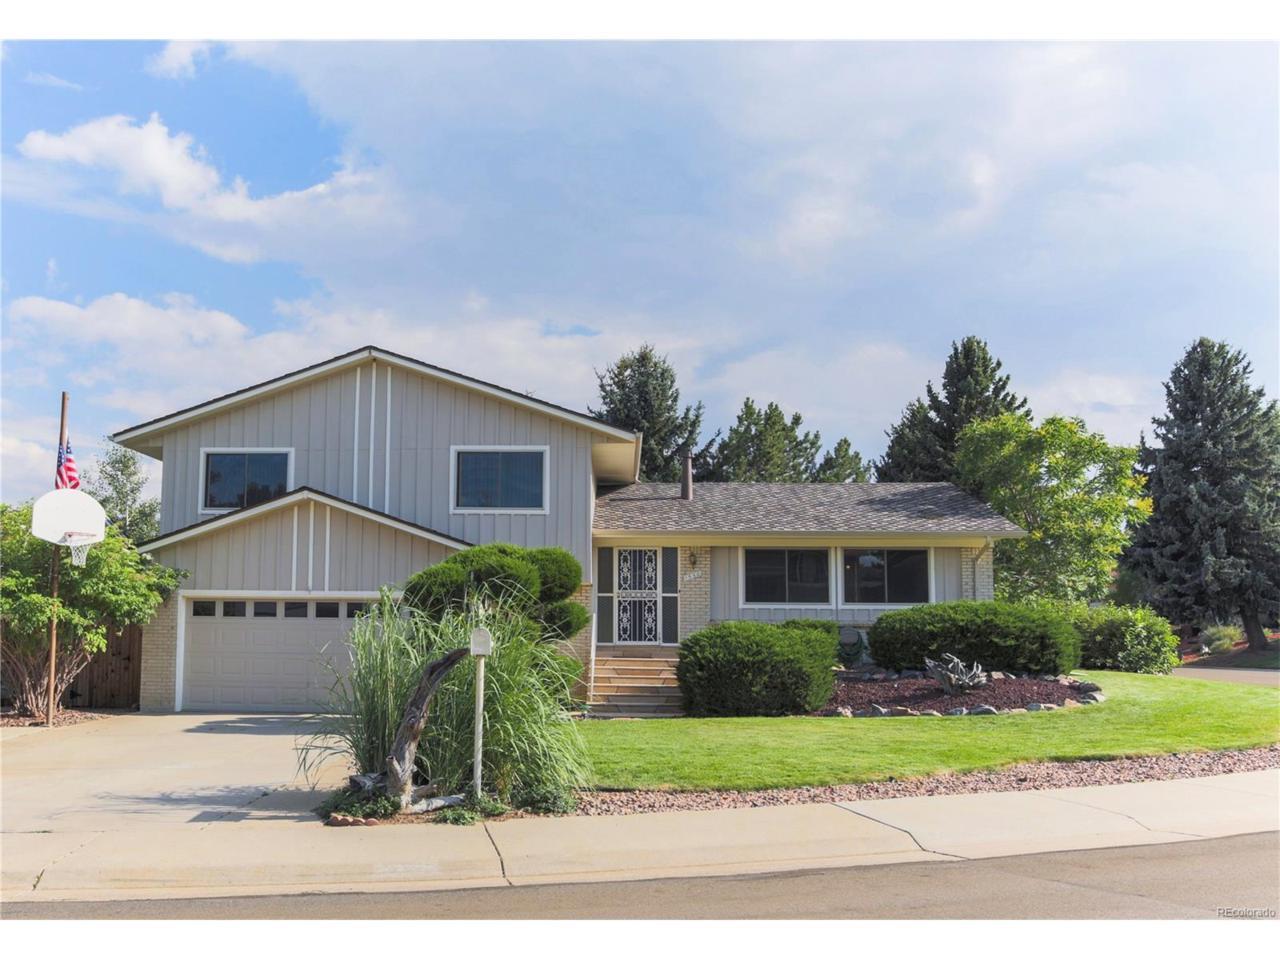 1550 S Zang Street, Lakewood, CO 80228 (MLS #7636357) :: 8z Real Estate